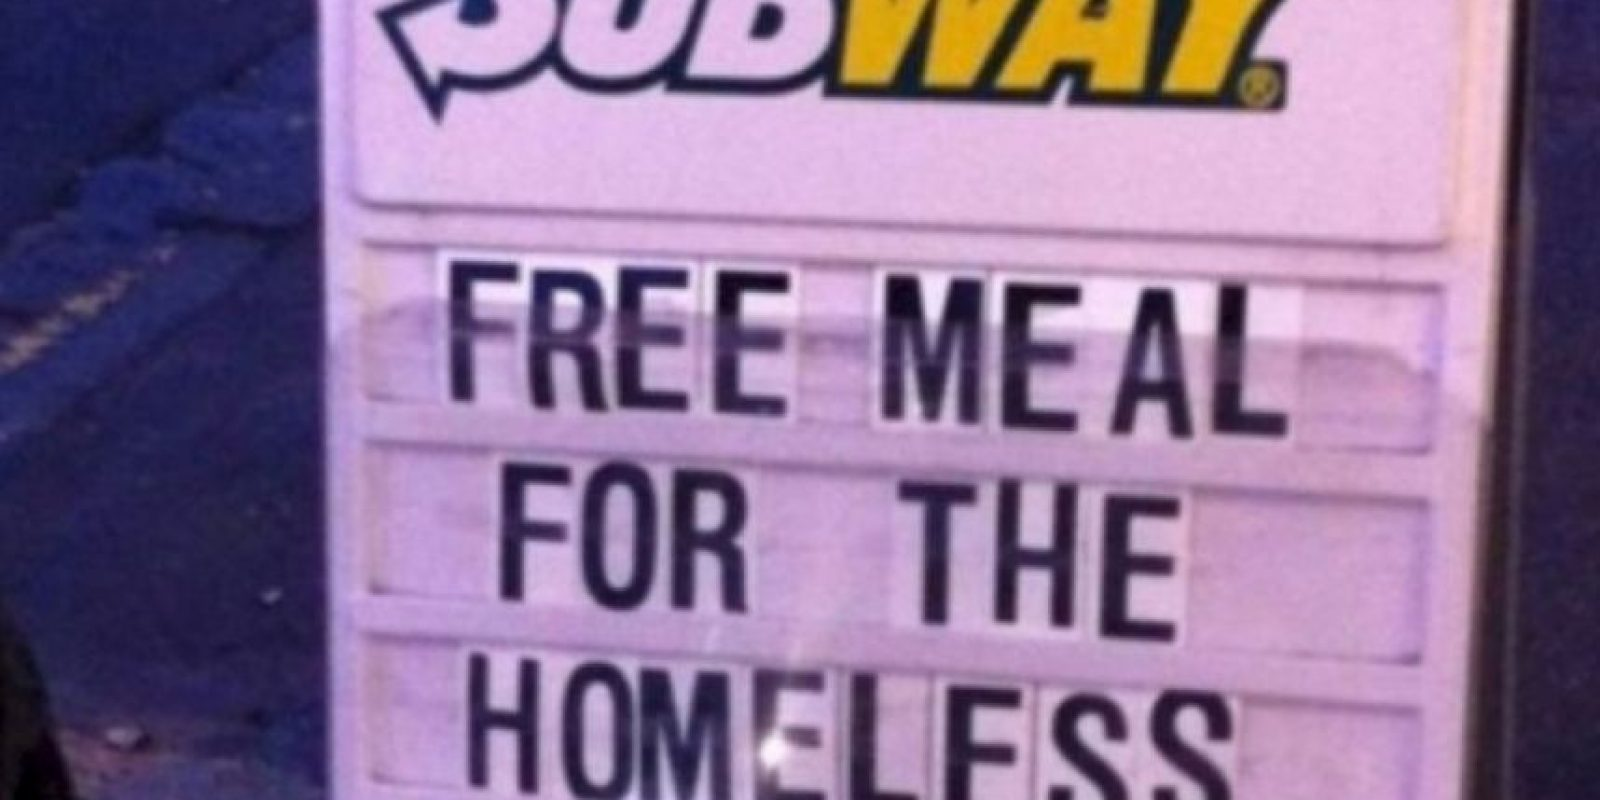 Subway alimenta a algunas personas sin hogar. Foto:Tumblr